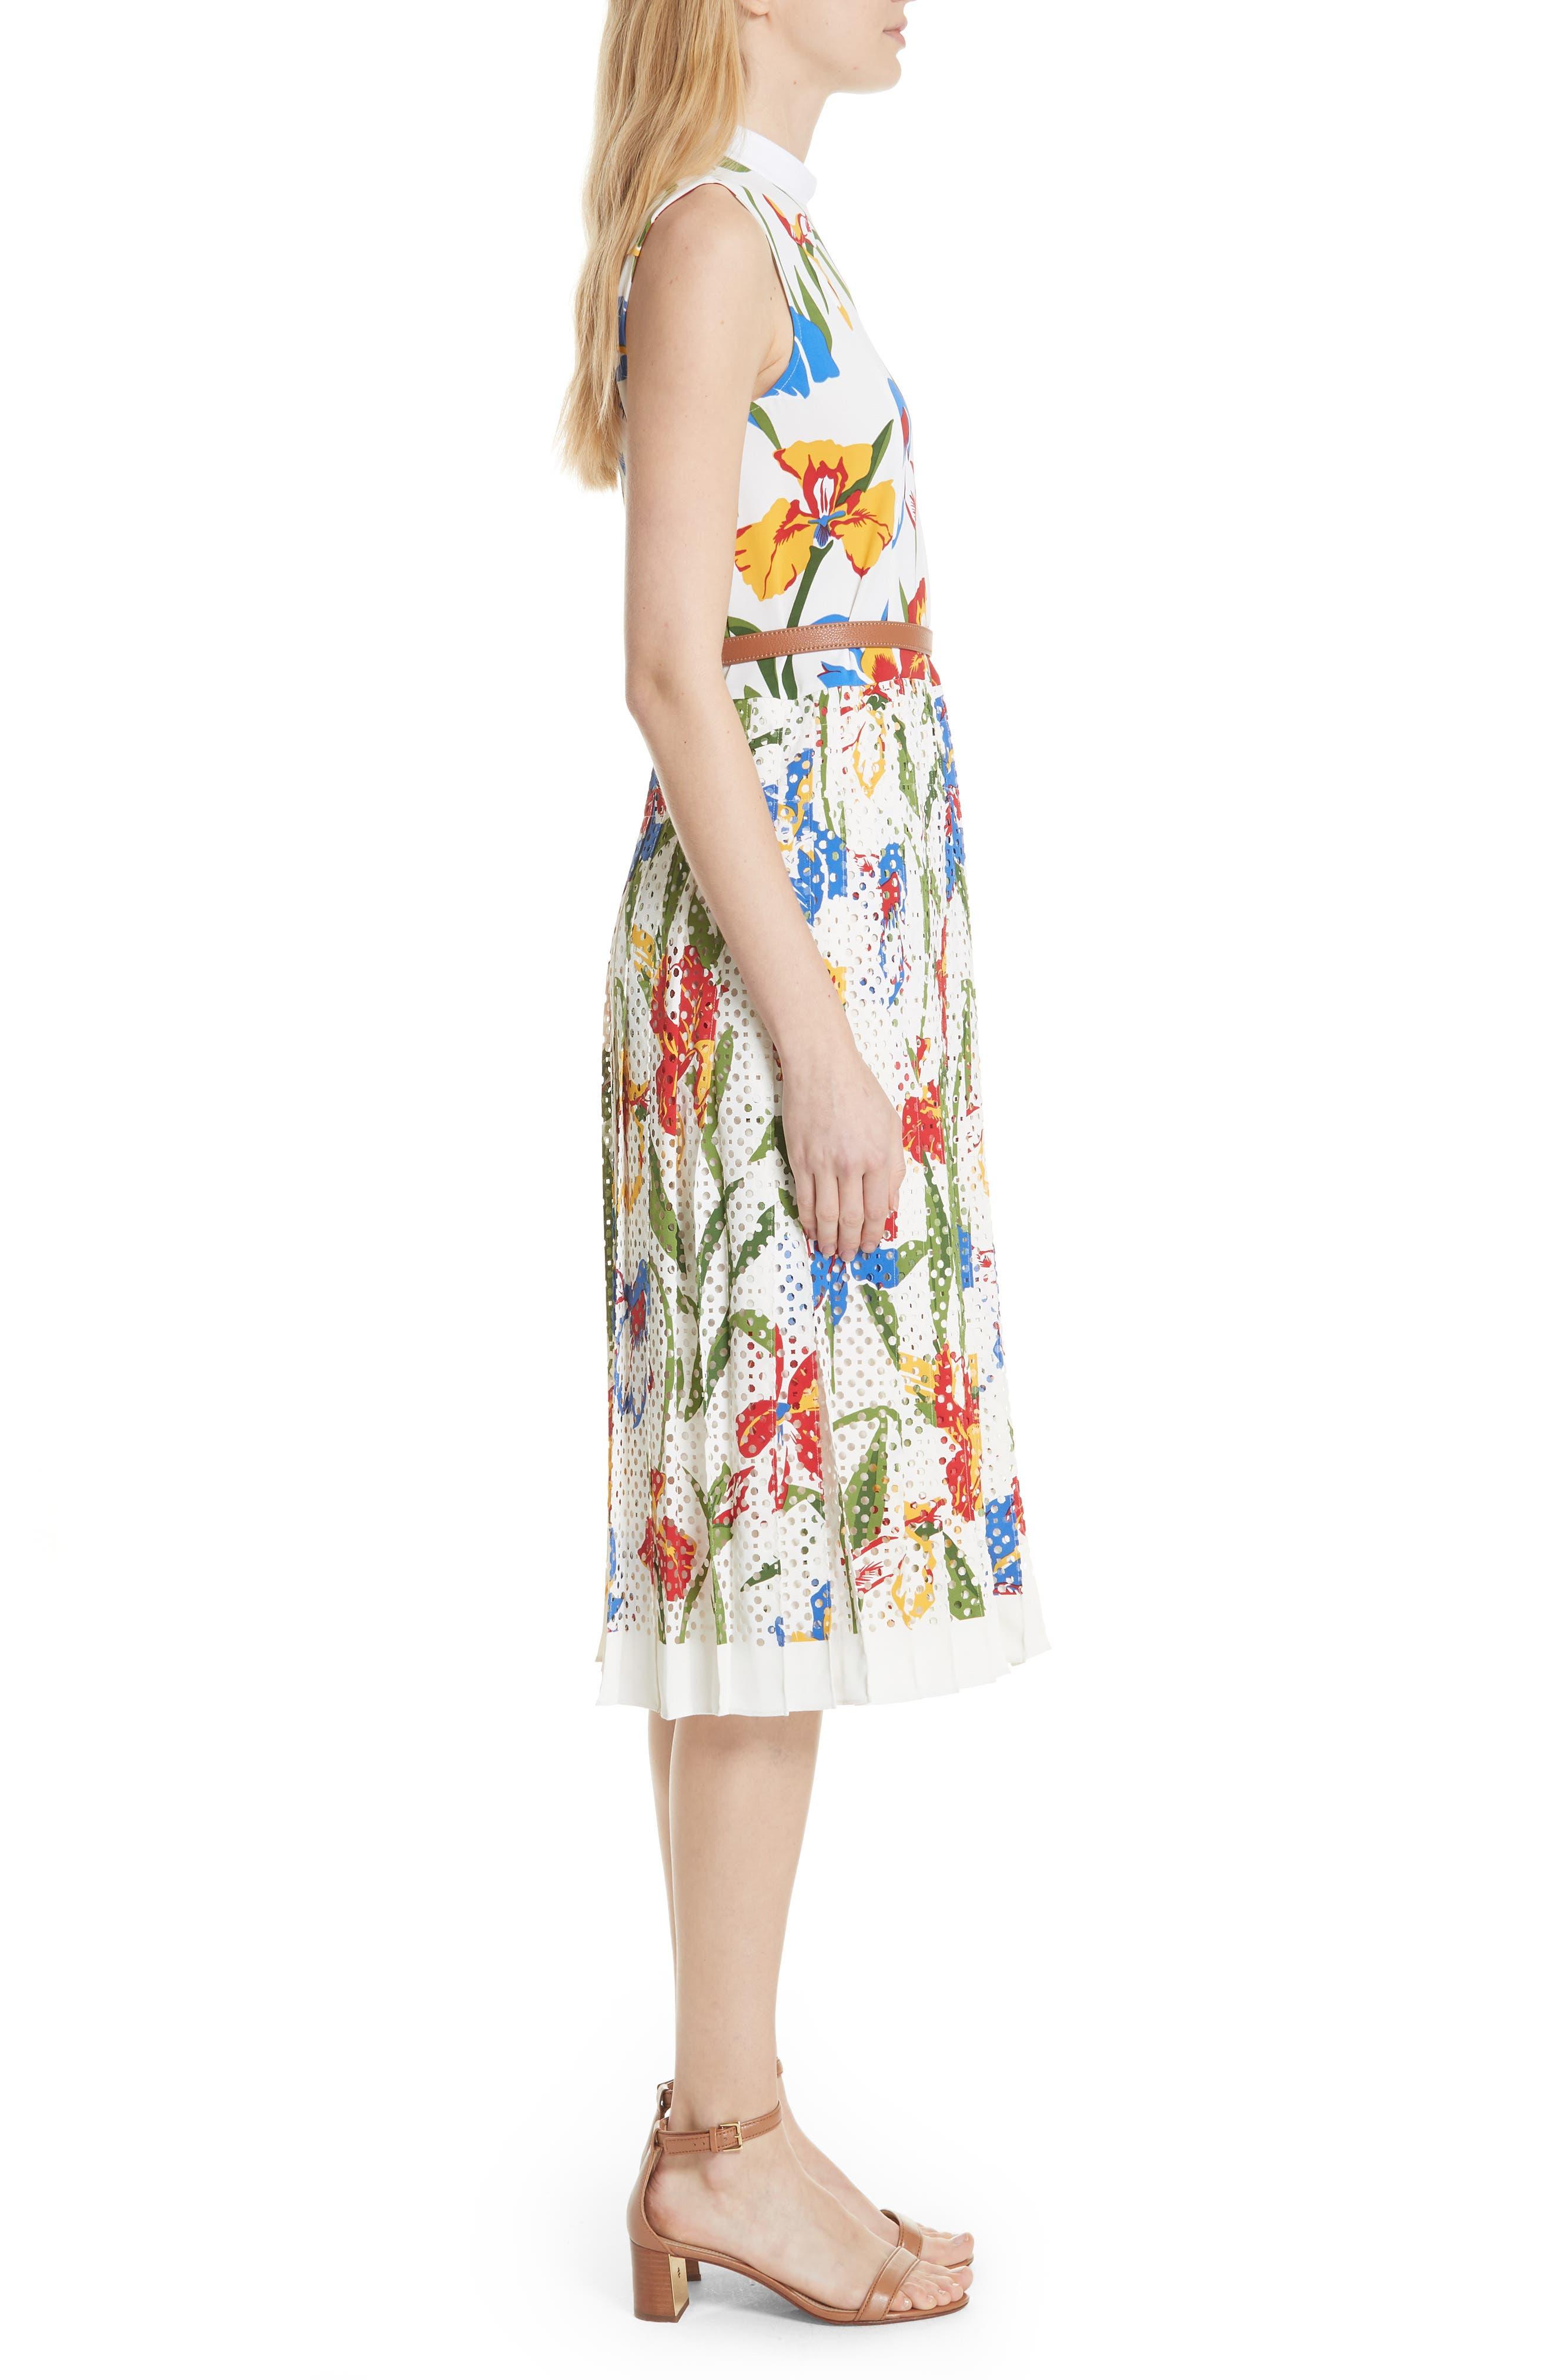 Carine Floral Dress,                             Alternate thumbnail 3, color,                             Painted Iris